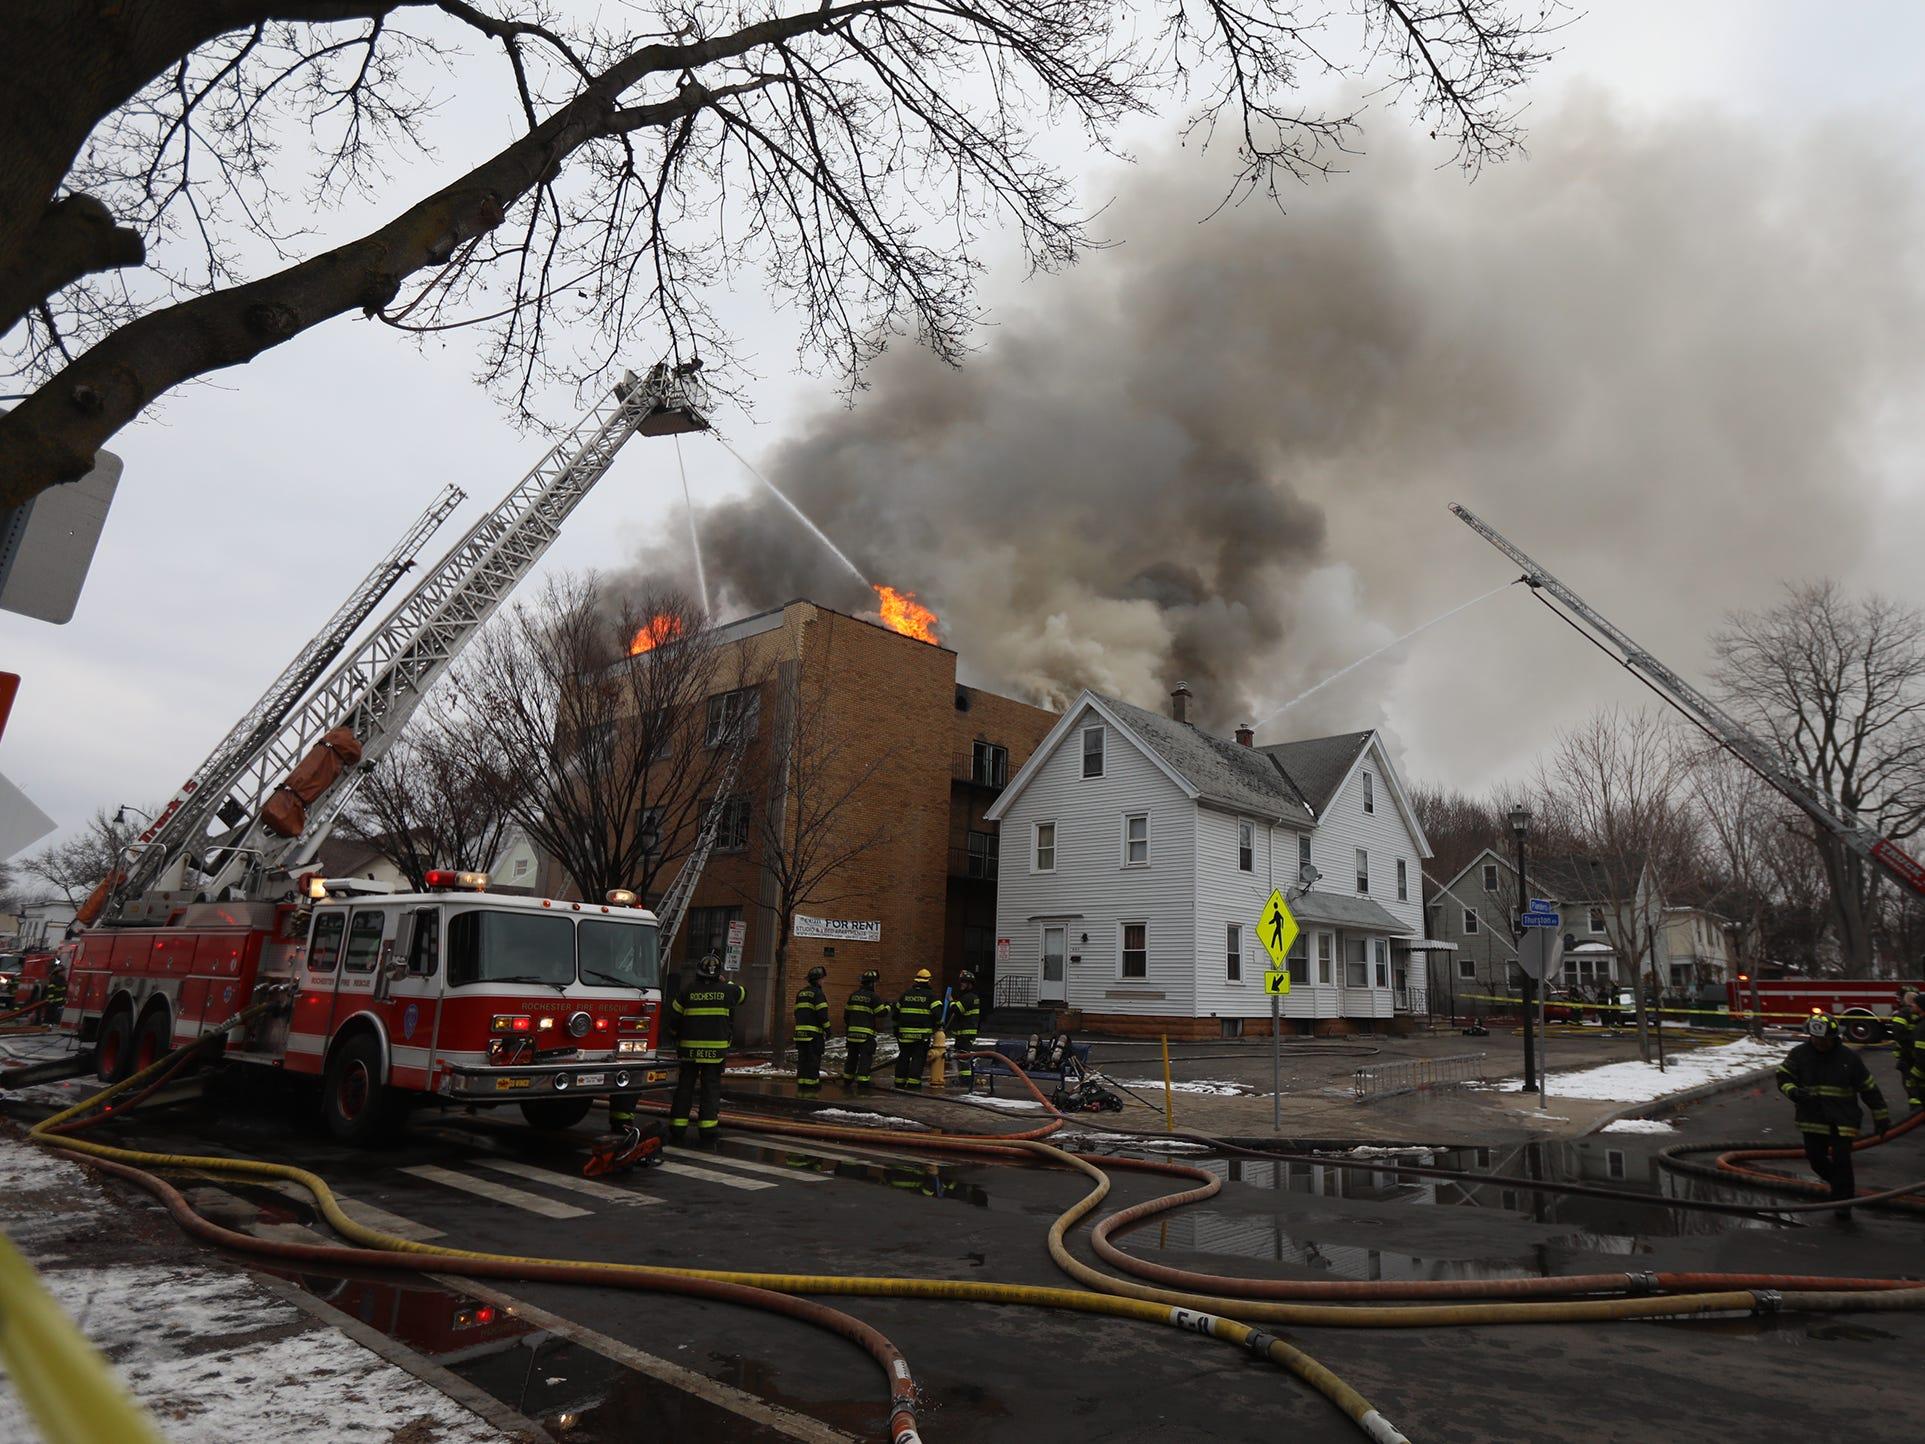 Crews battle 5-alarm fire at apartment building on Thurston Road